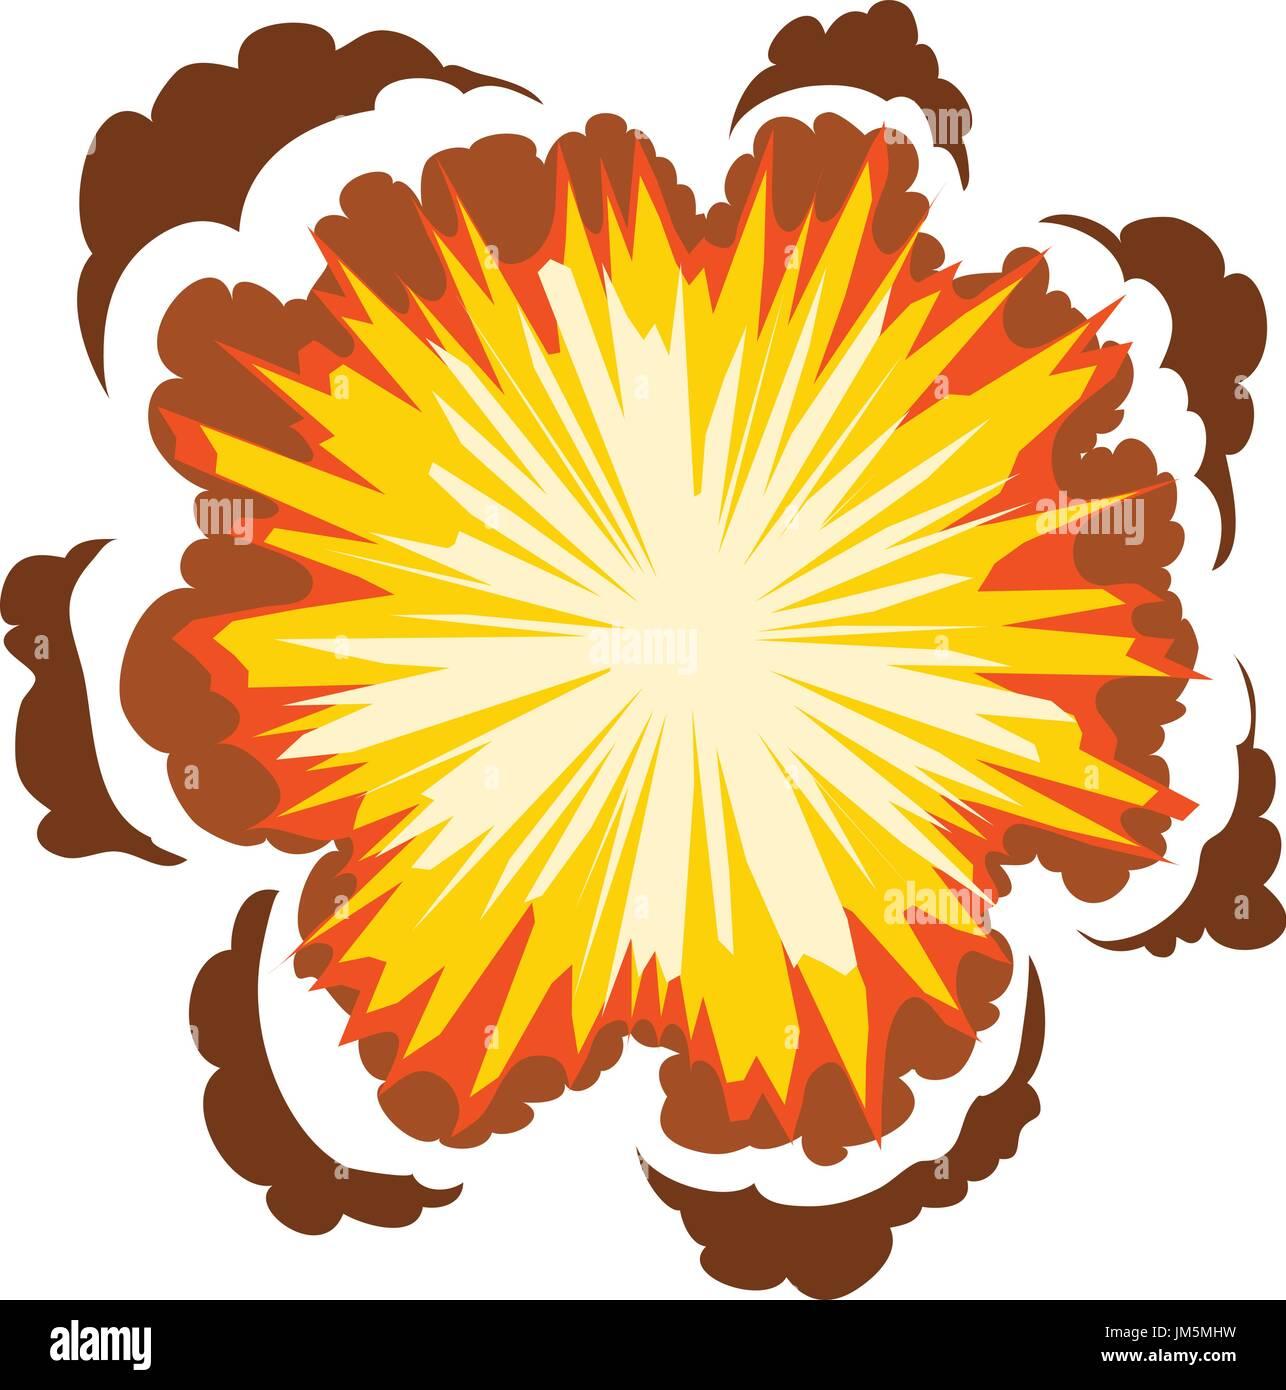 ground explosion stock photos  u0026 ground explosion stock images